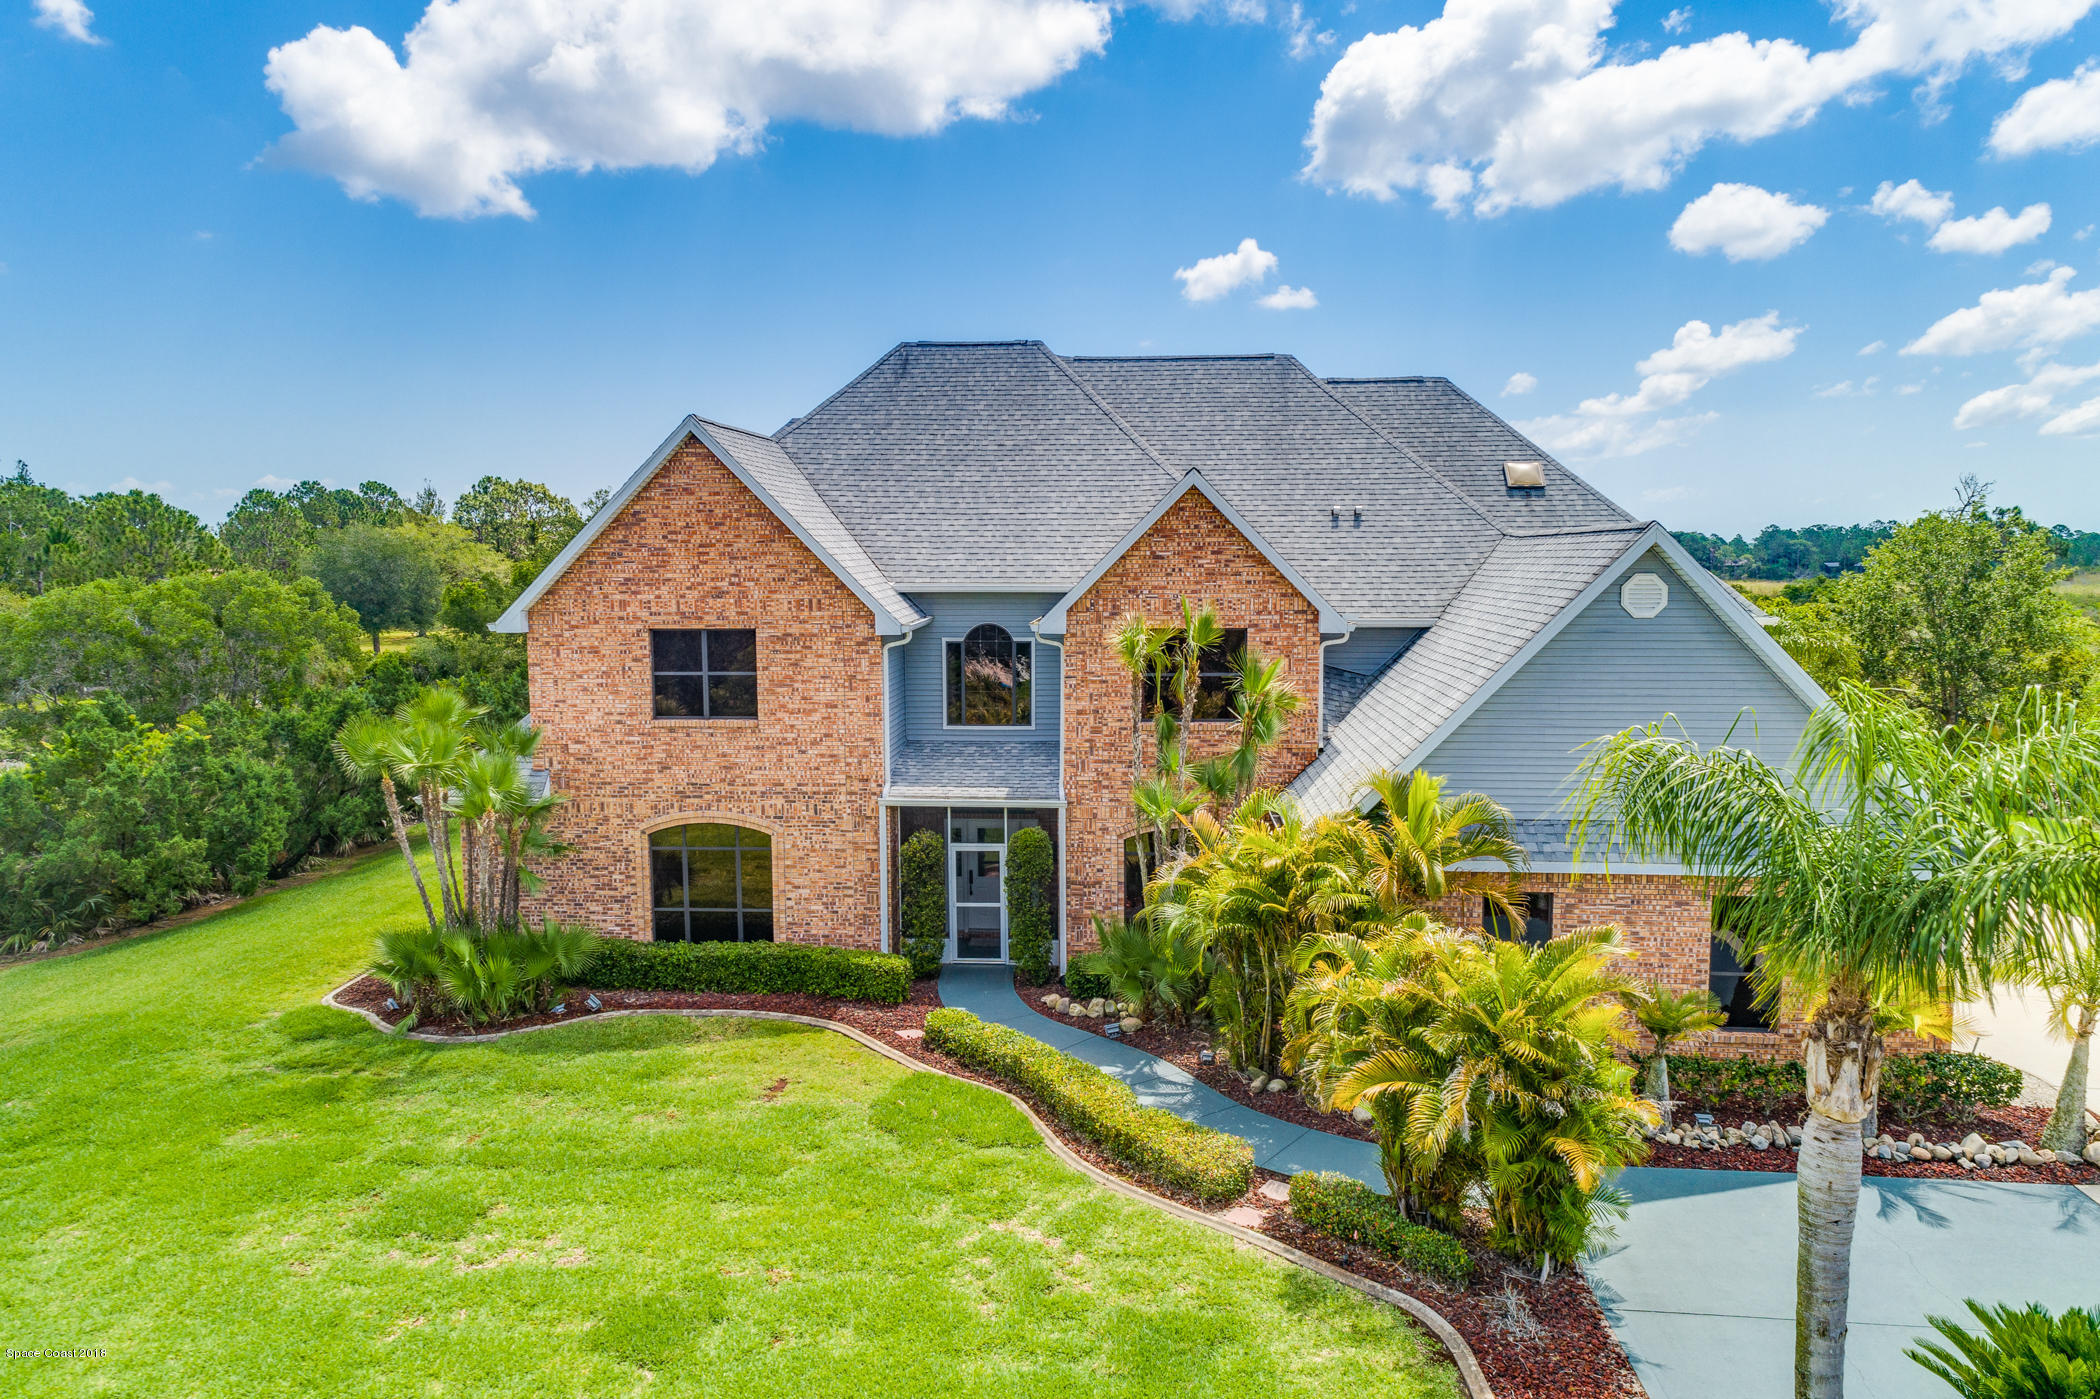 Single Family Home for Sale at 8685 Lake Ridge 8685 Lake Ridge Grant Valkaria, Florida 32909 United States